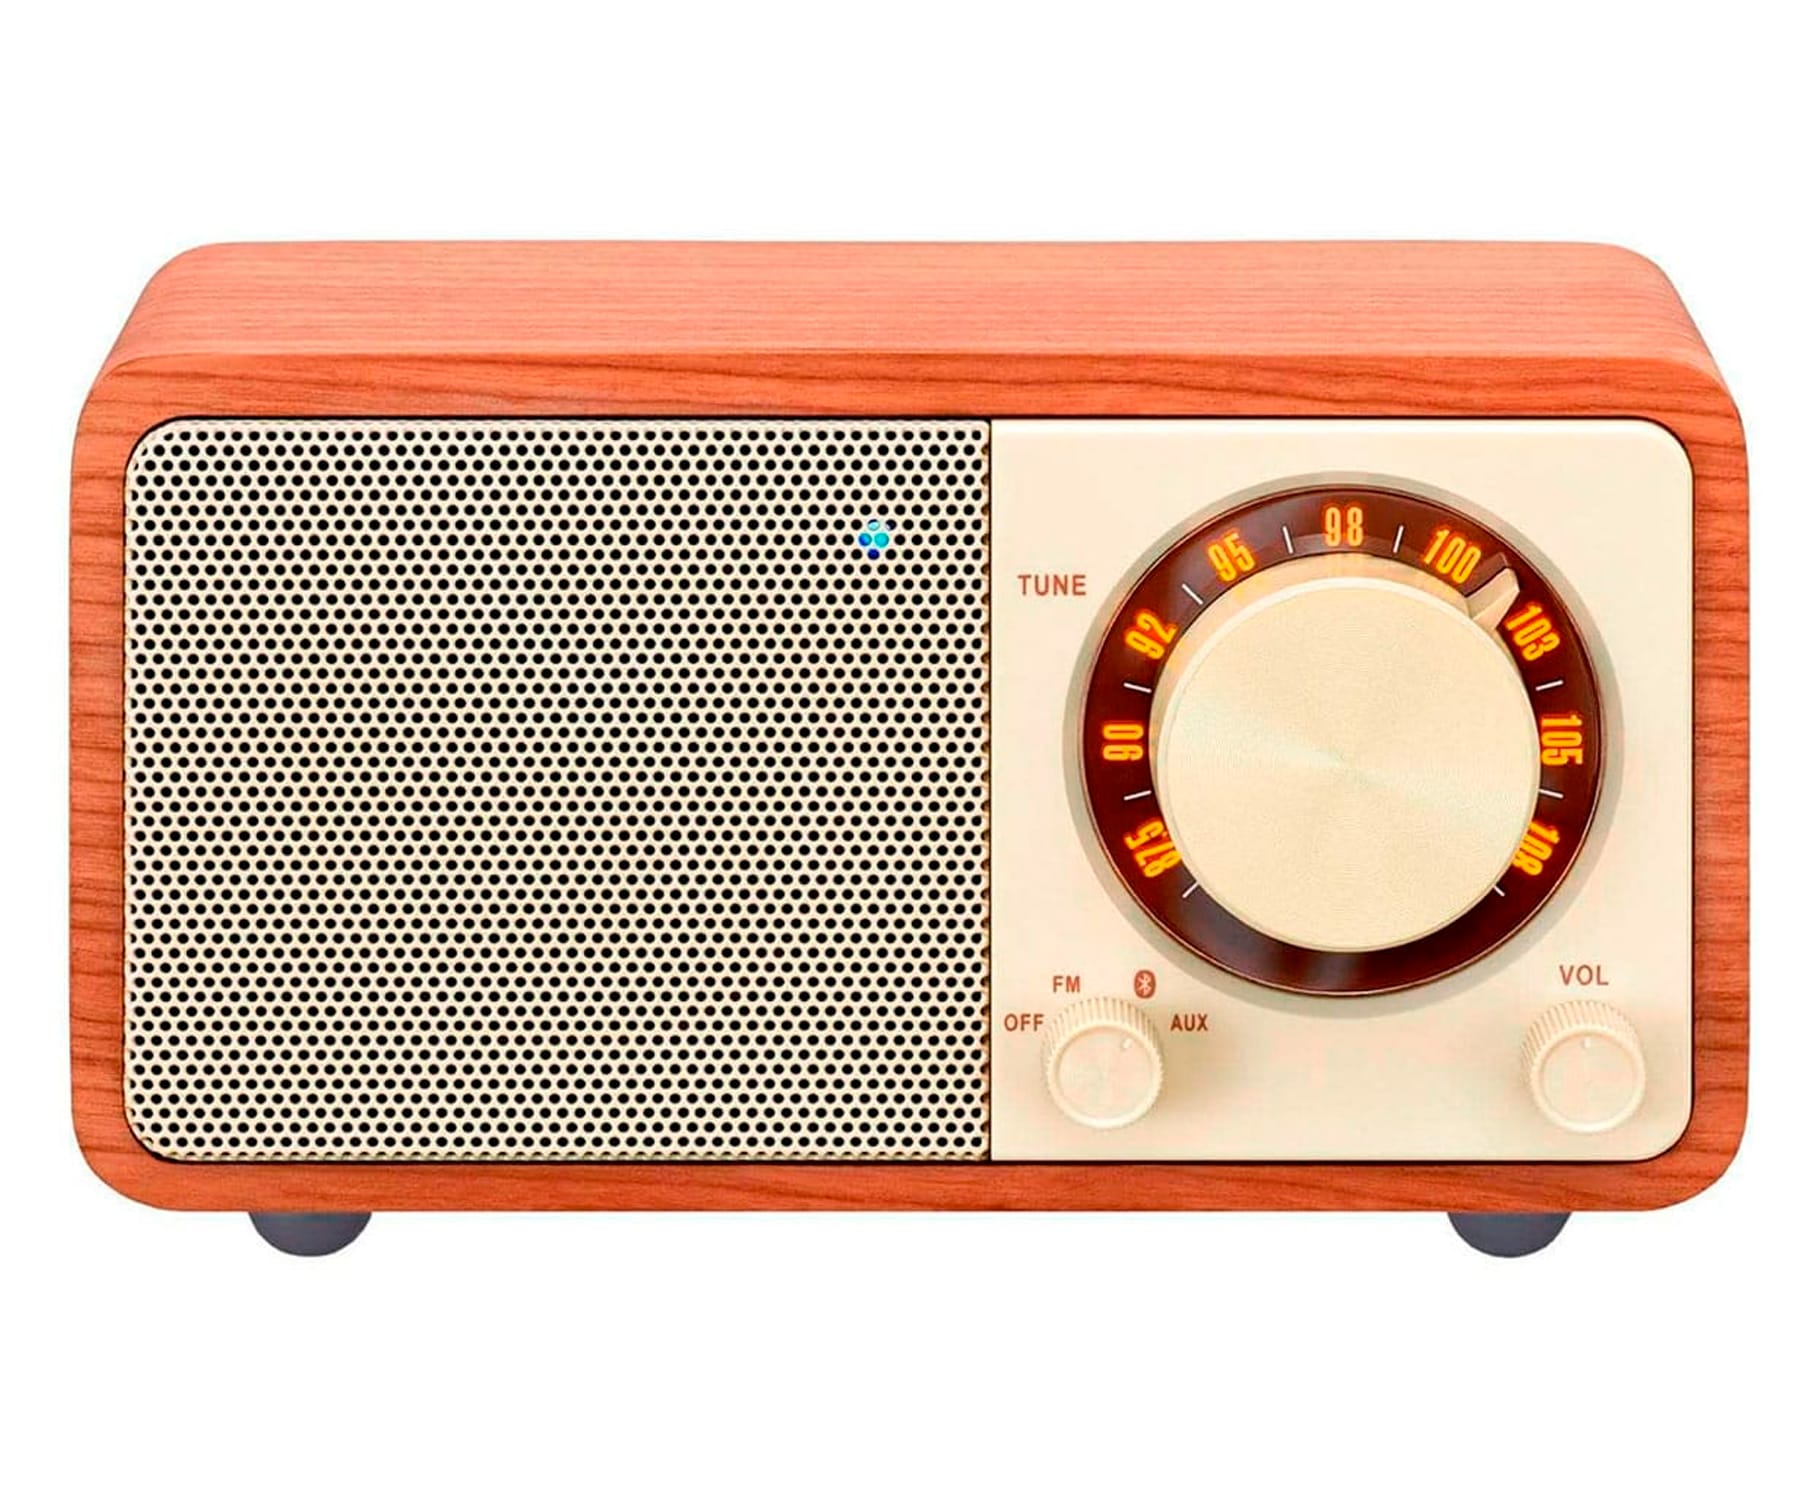 SANGEAN WR-7 NUEZ RADIO ANALÓGICA SOBREMESA FM BLUETOOTH BATERÍA LI-ION RECARGABLE